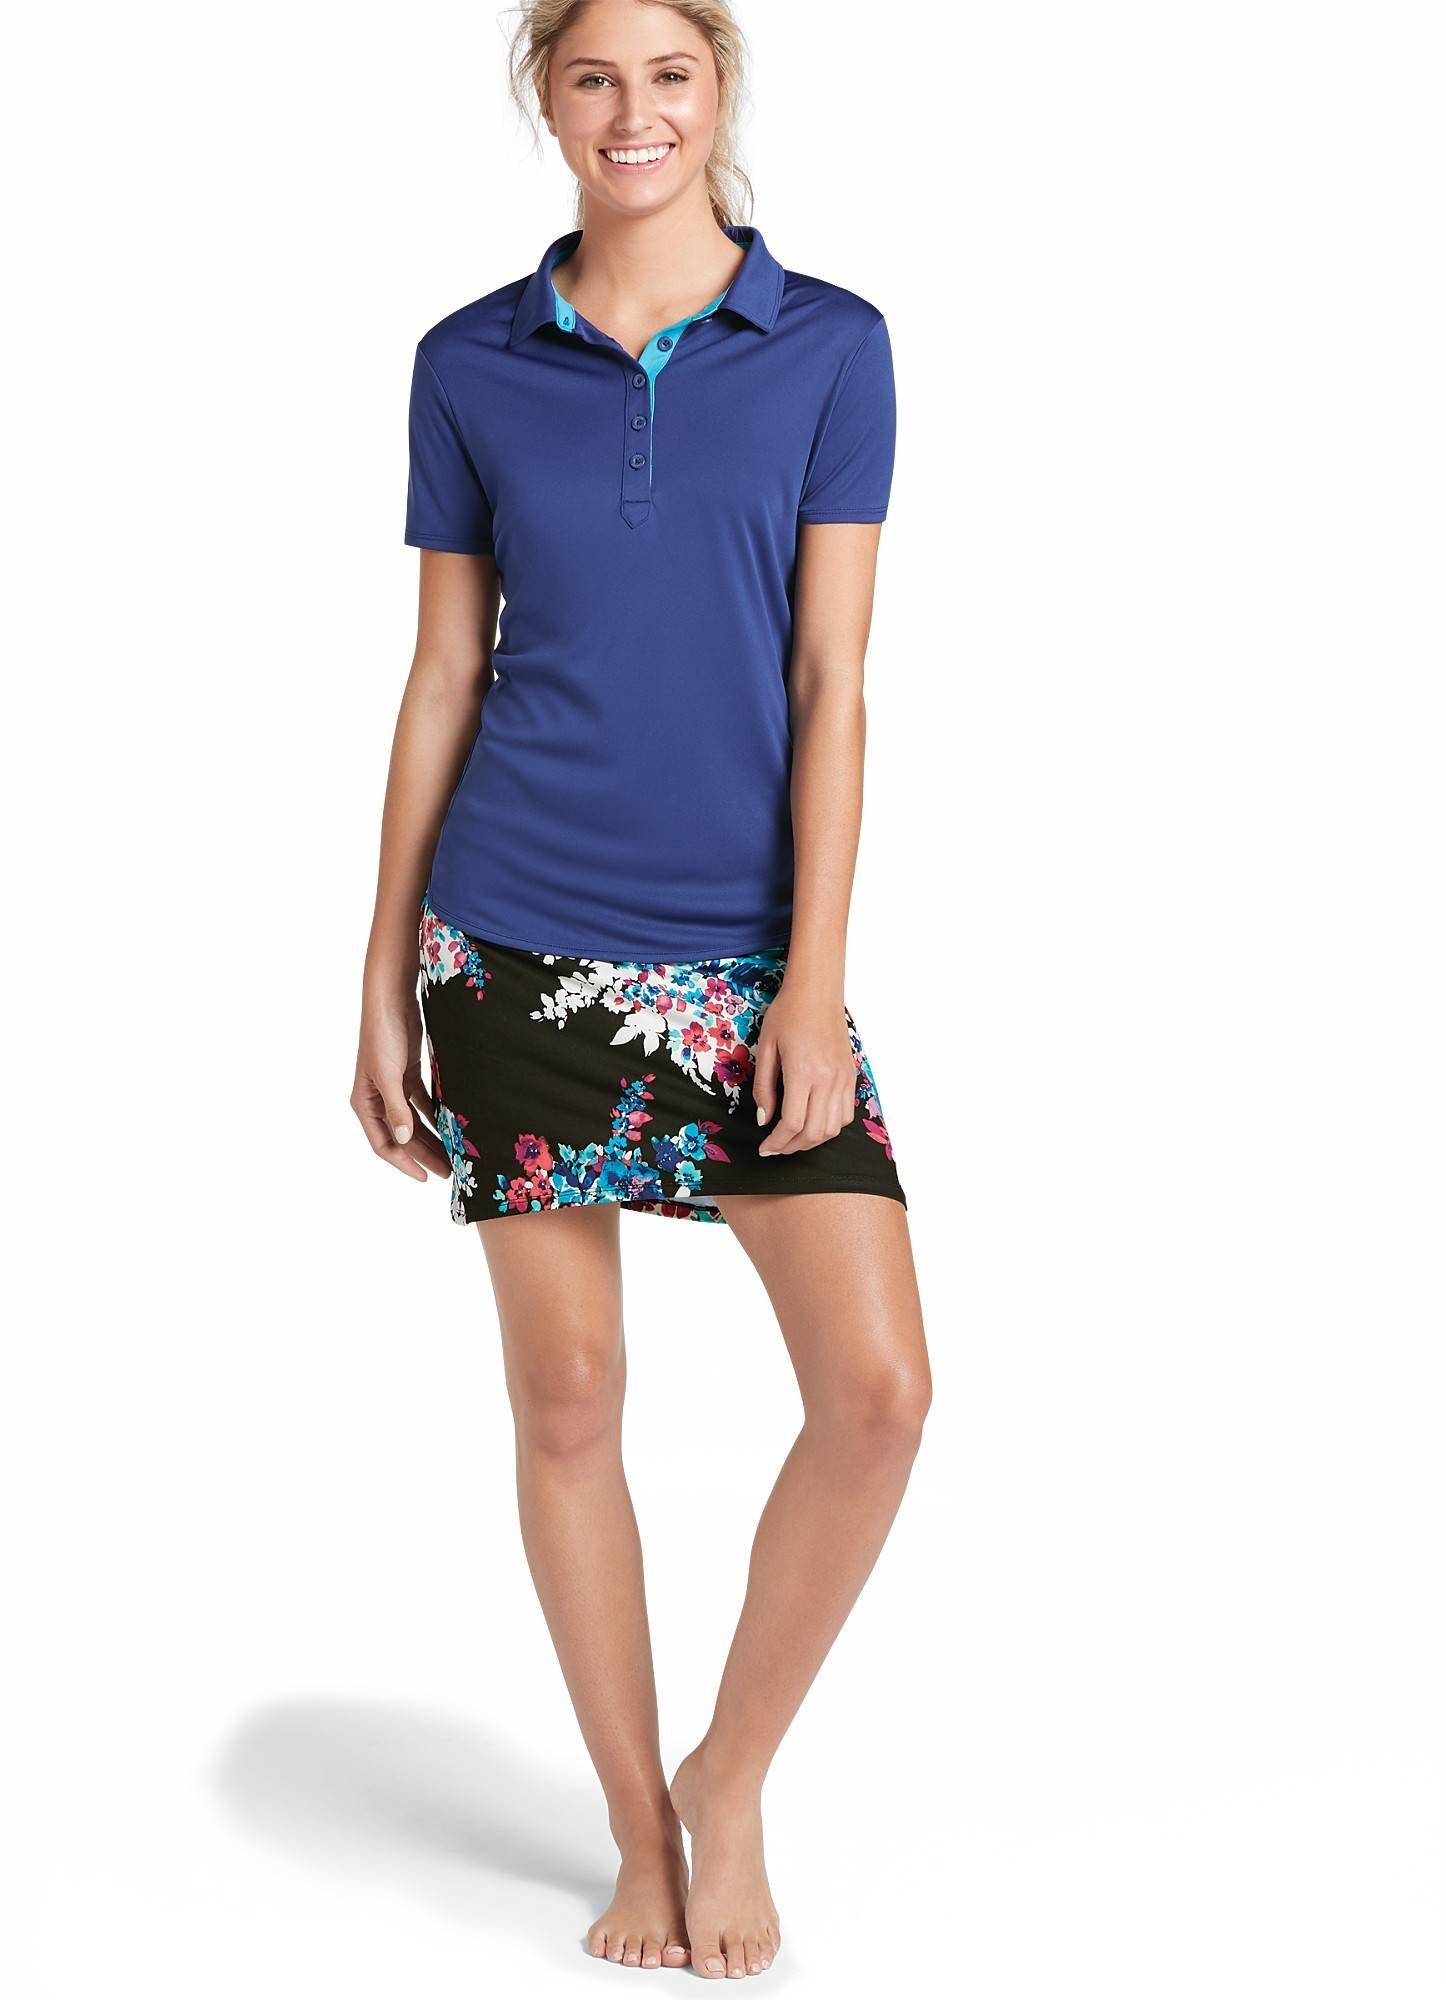 Jockey Women's Activewear Women's Performance Polo, Egyptian Blue, L